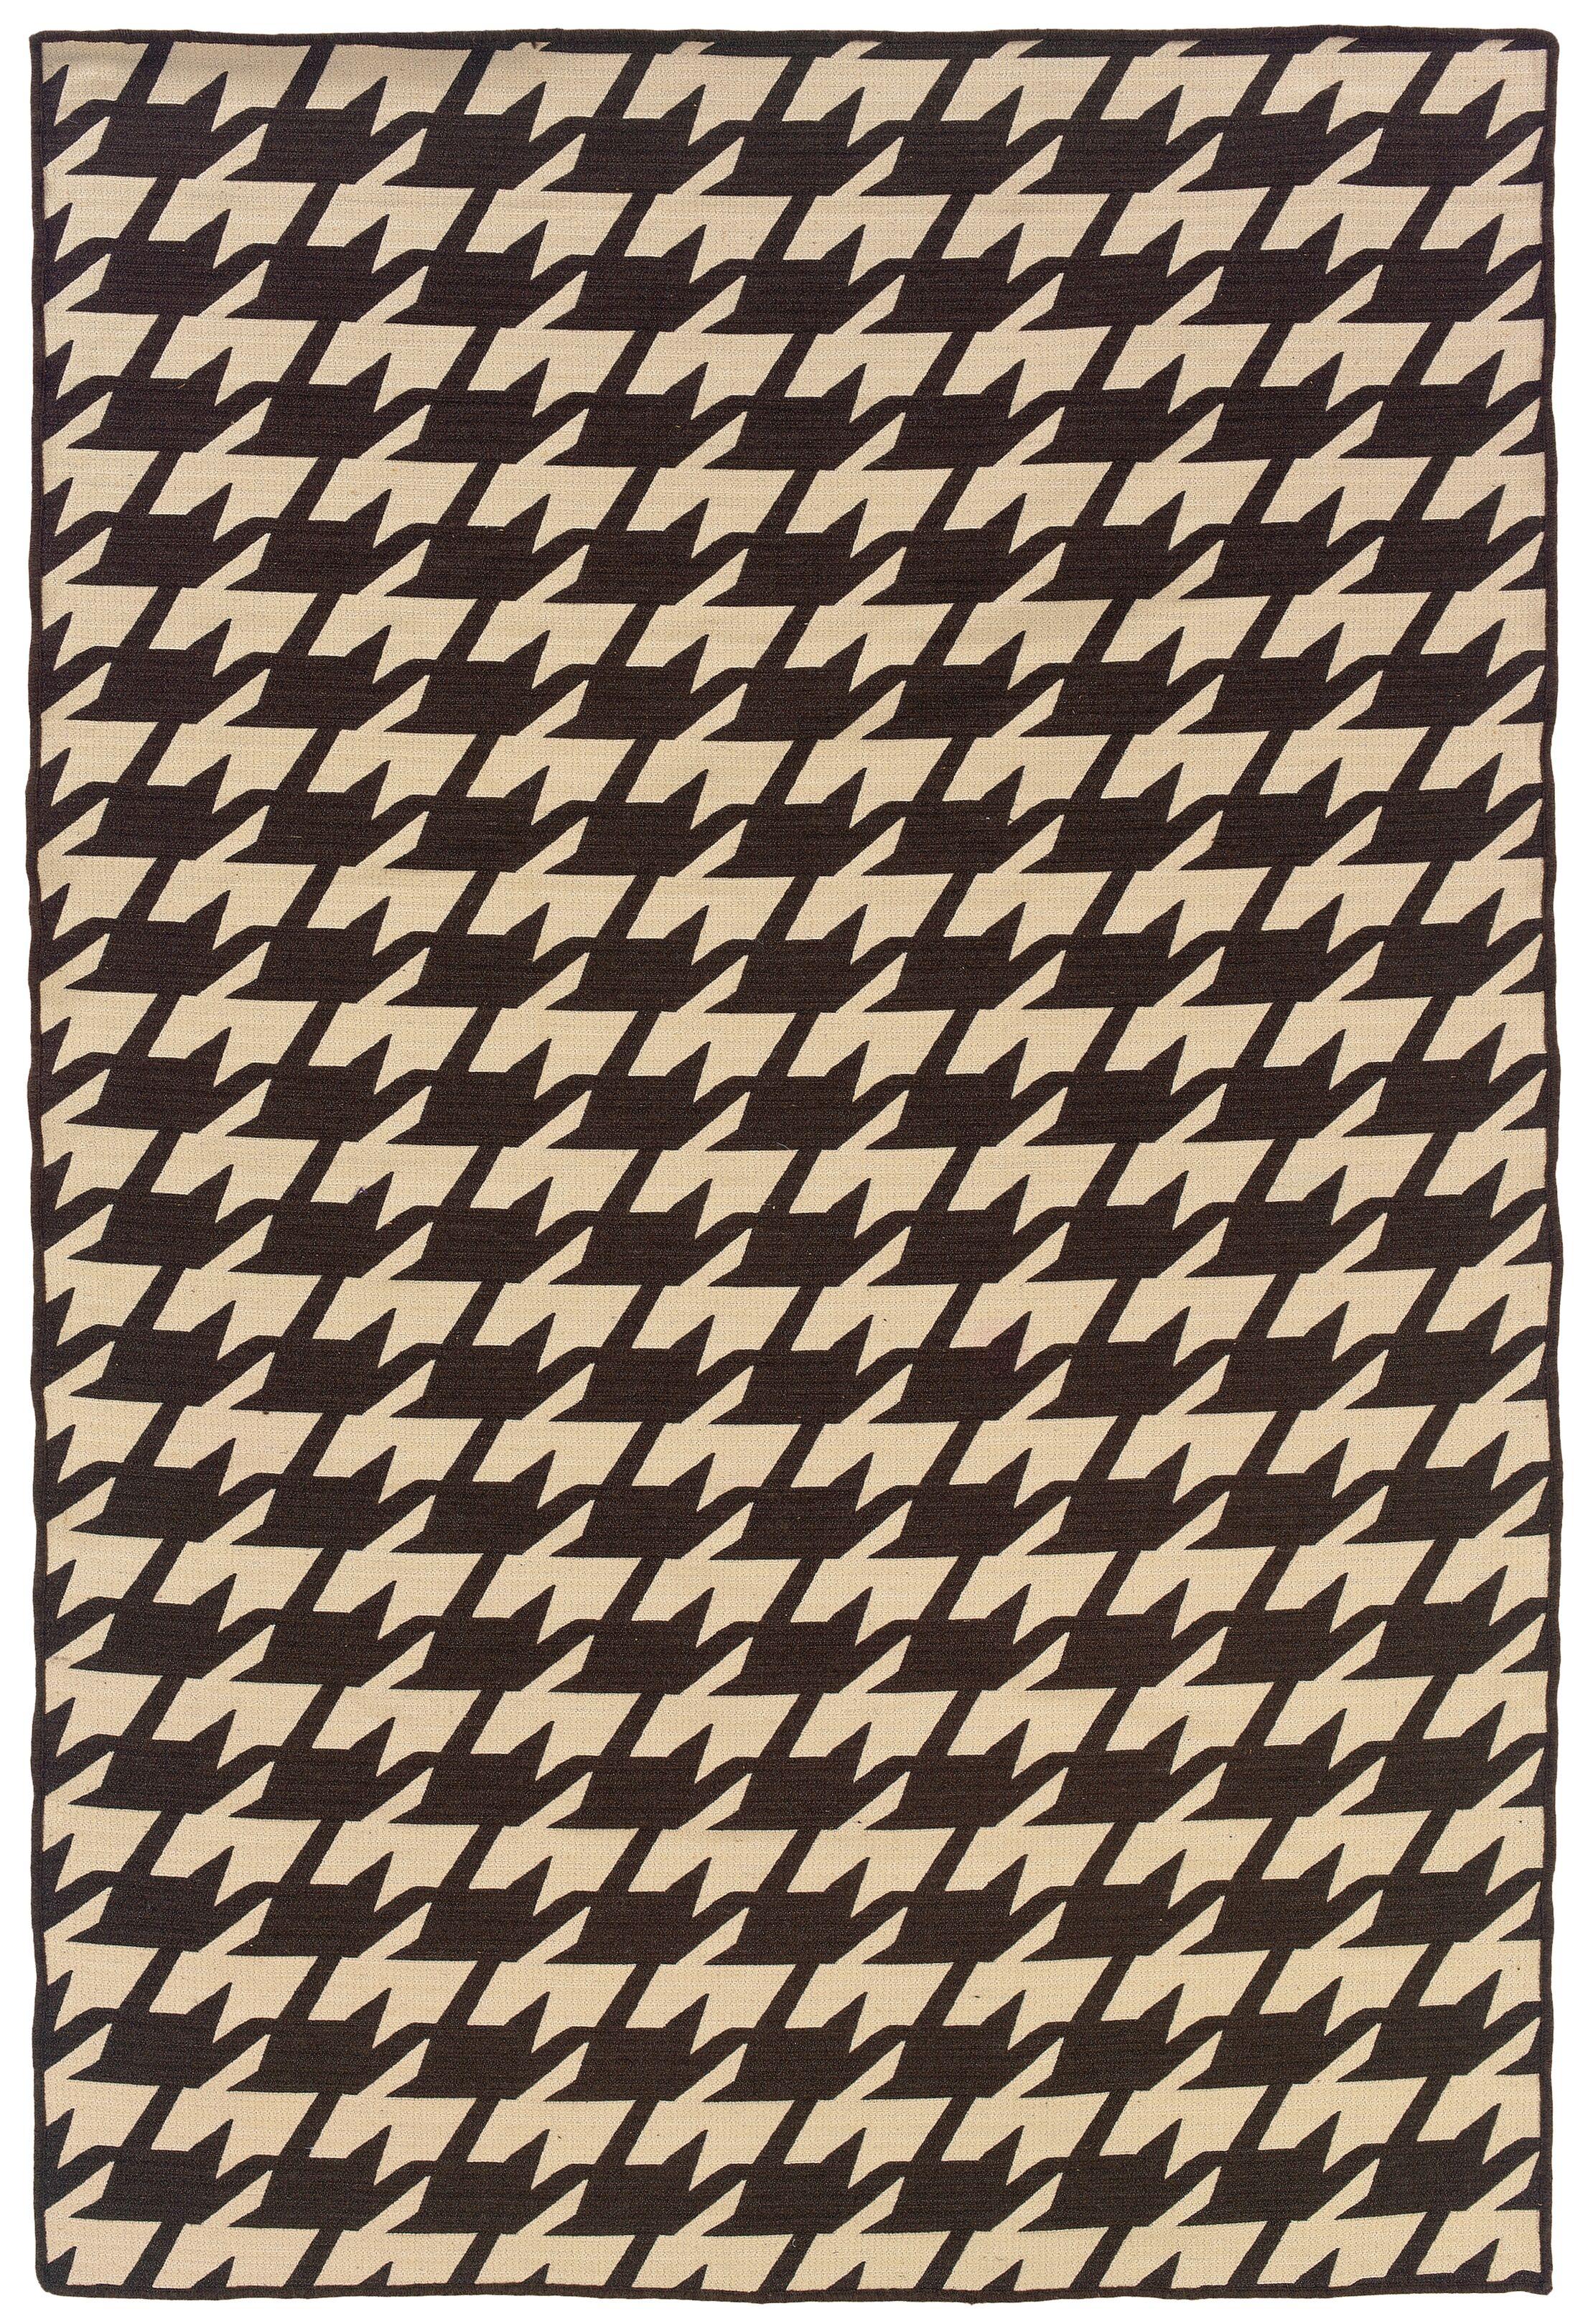 Destinee Hand-Tufted Brown/Beige Area Rug Rug Size: 5' x 8'